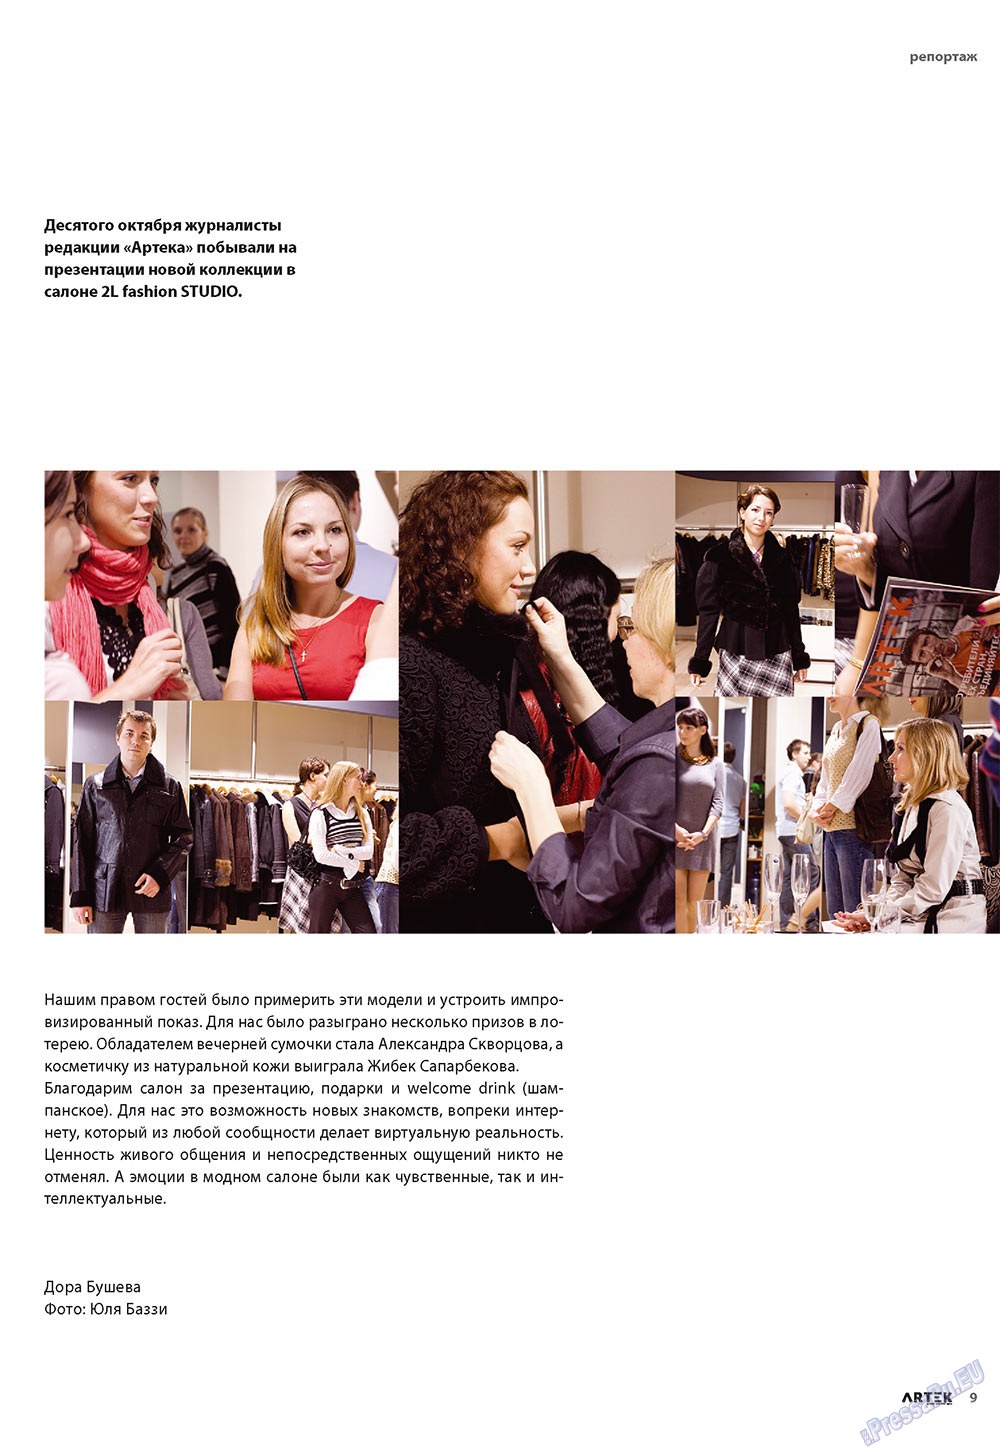 Артек (журнал). 2009 год, номер 5, стр. 9